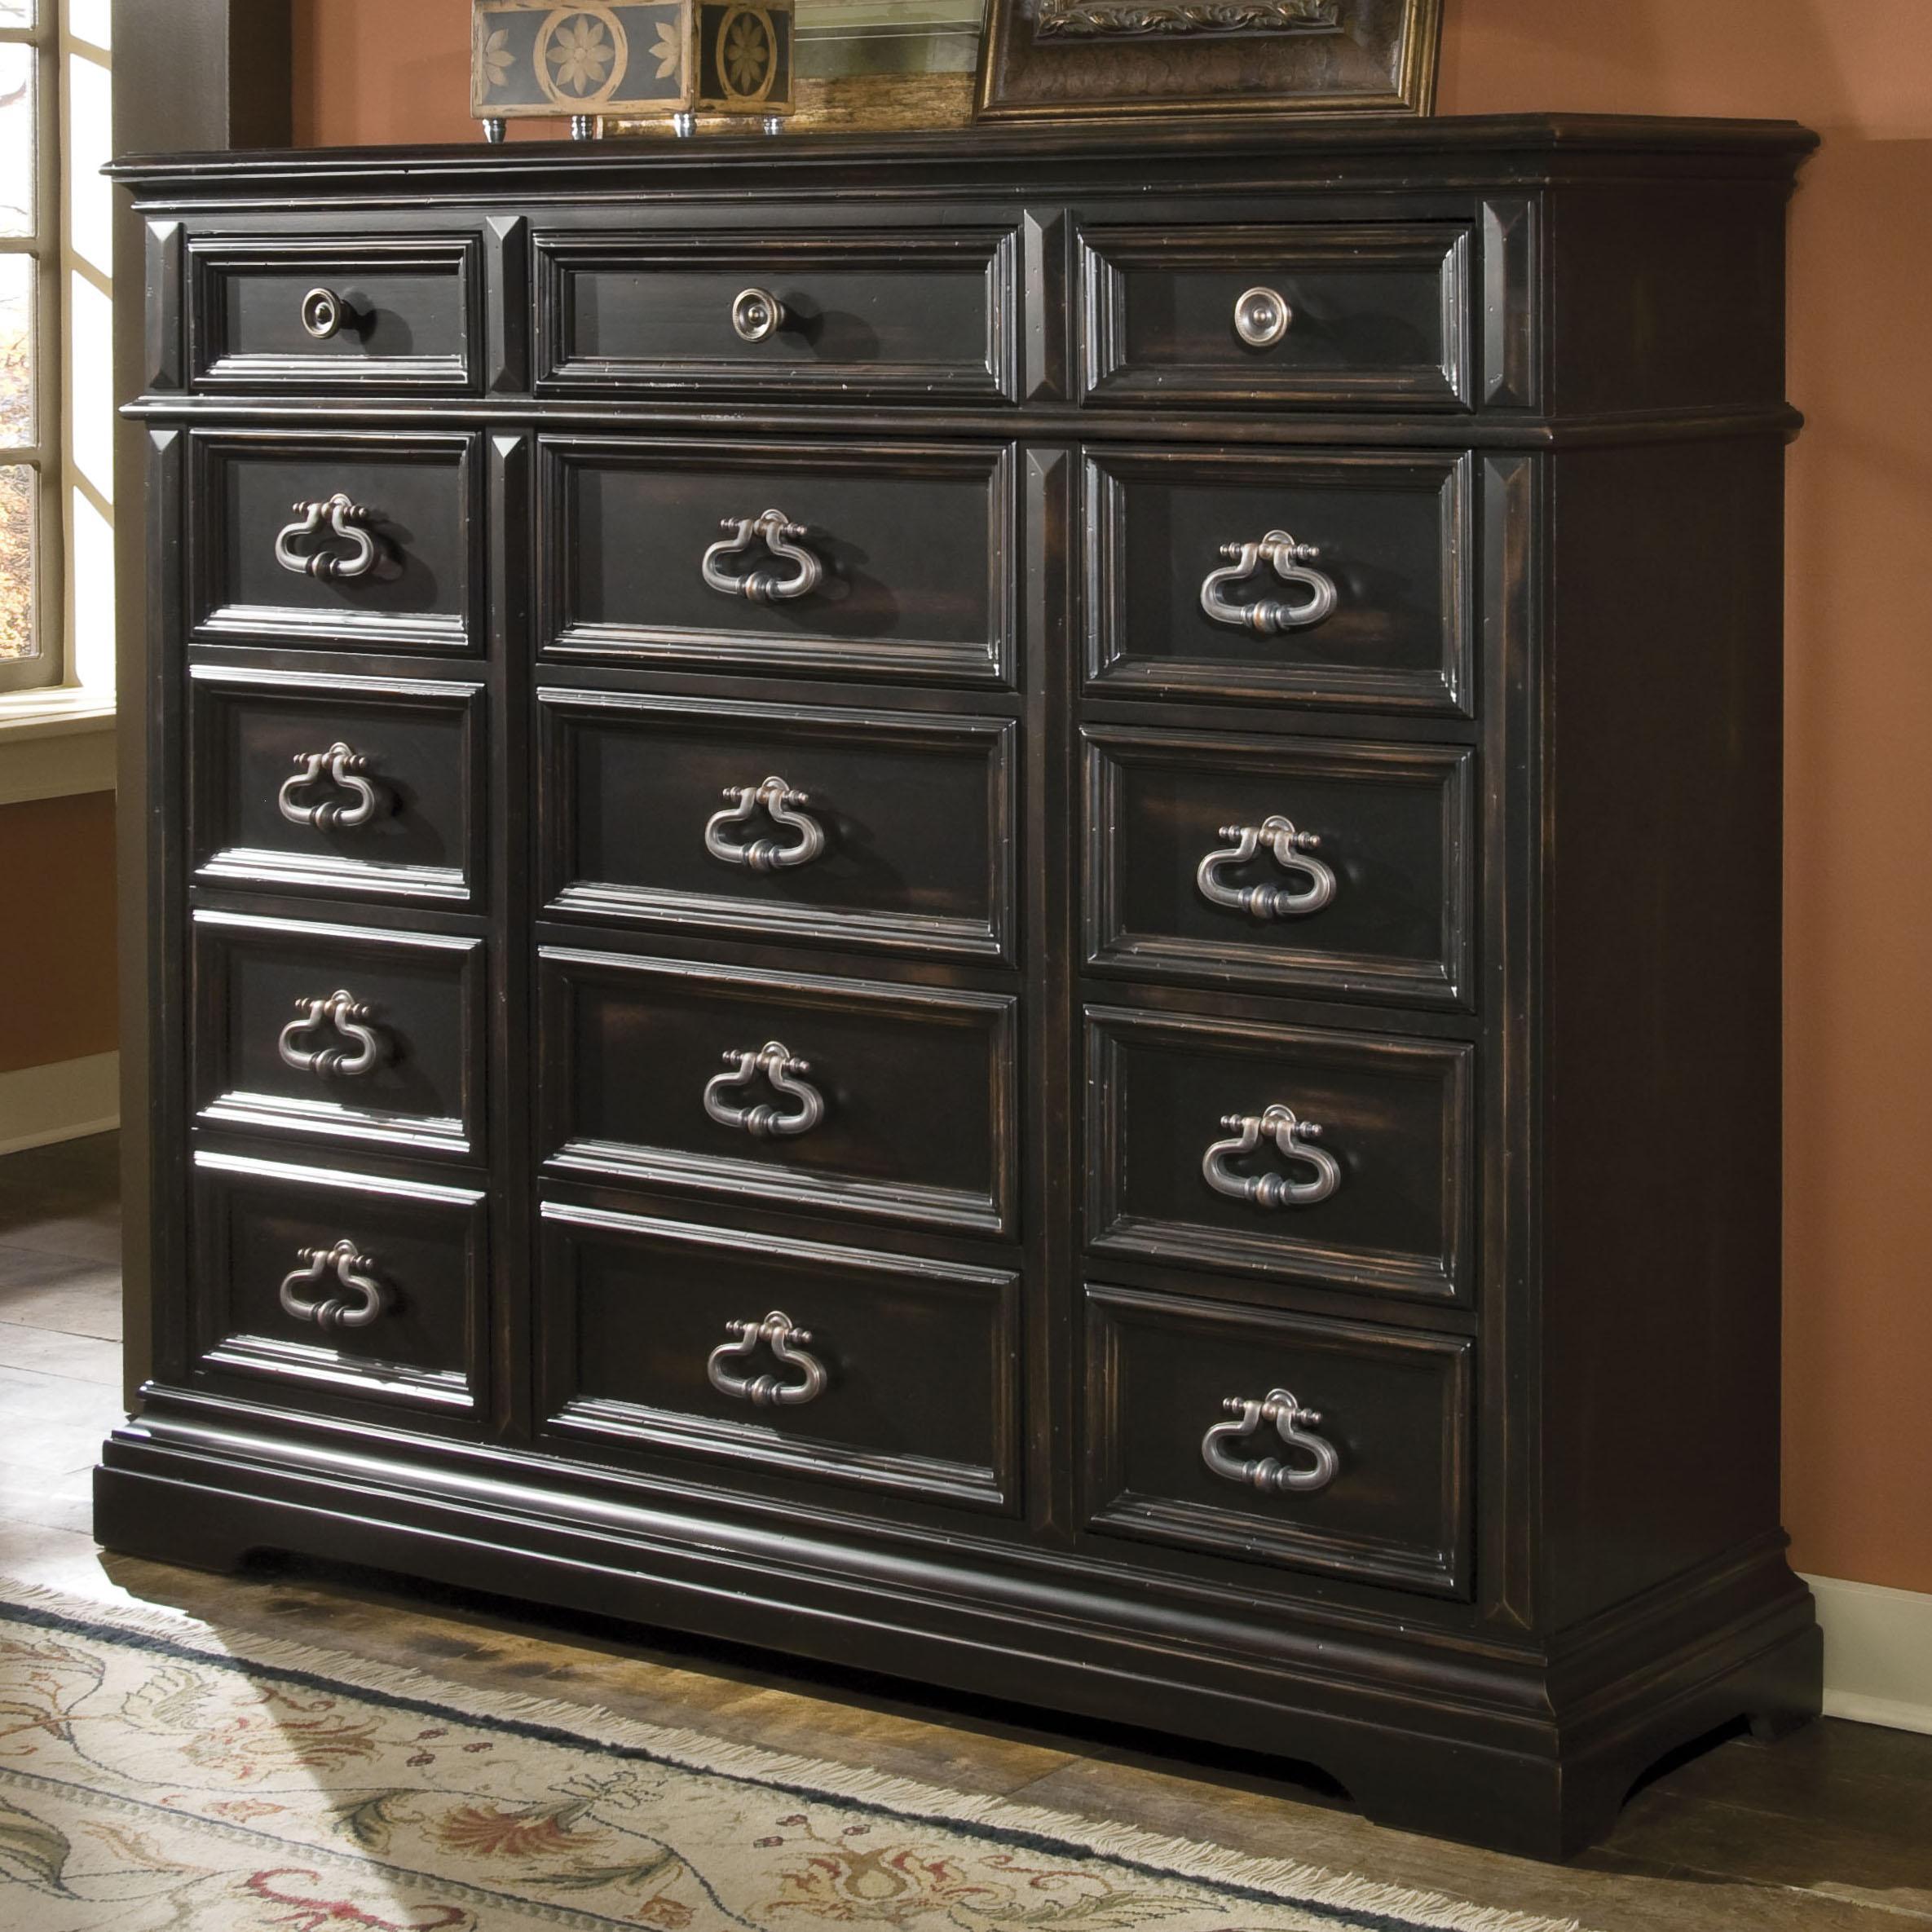 Beautiful Pulaski Furniture Brookfield 15 Drawer Gentlemenu0027s Bedroom Chest